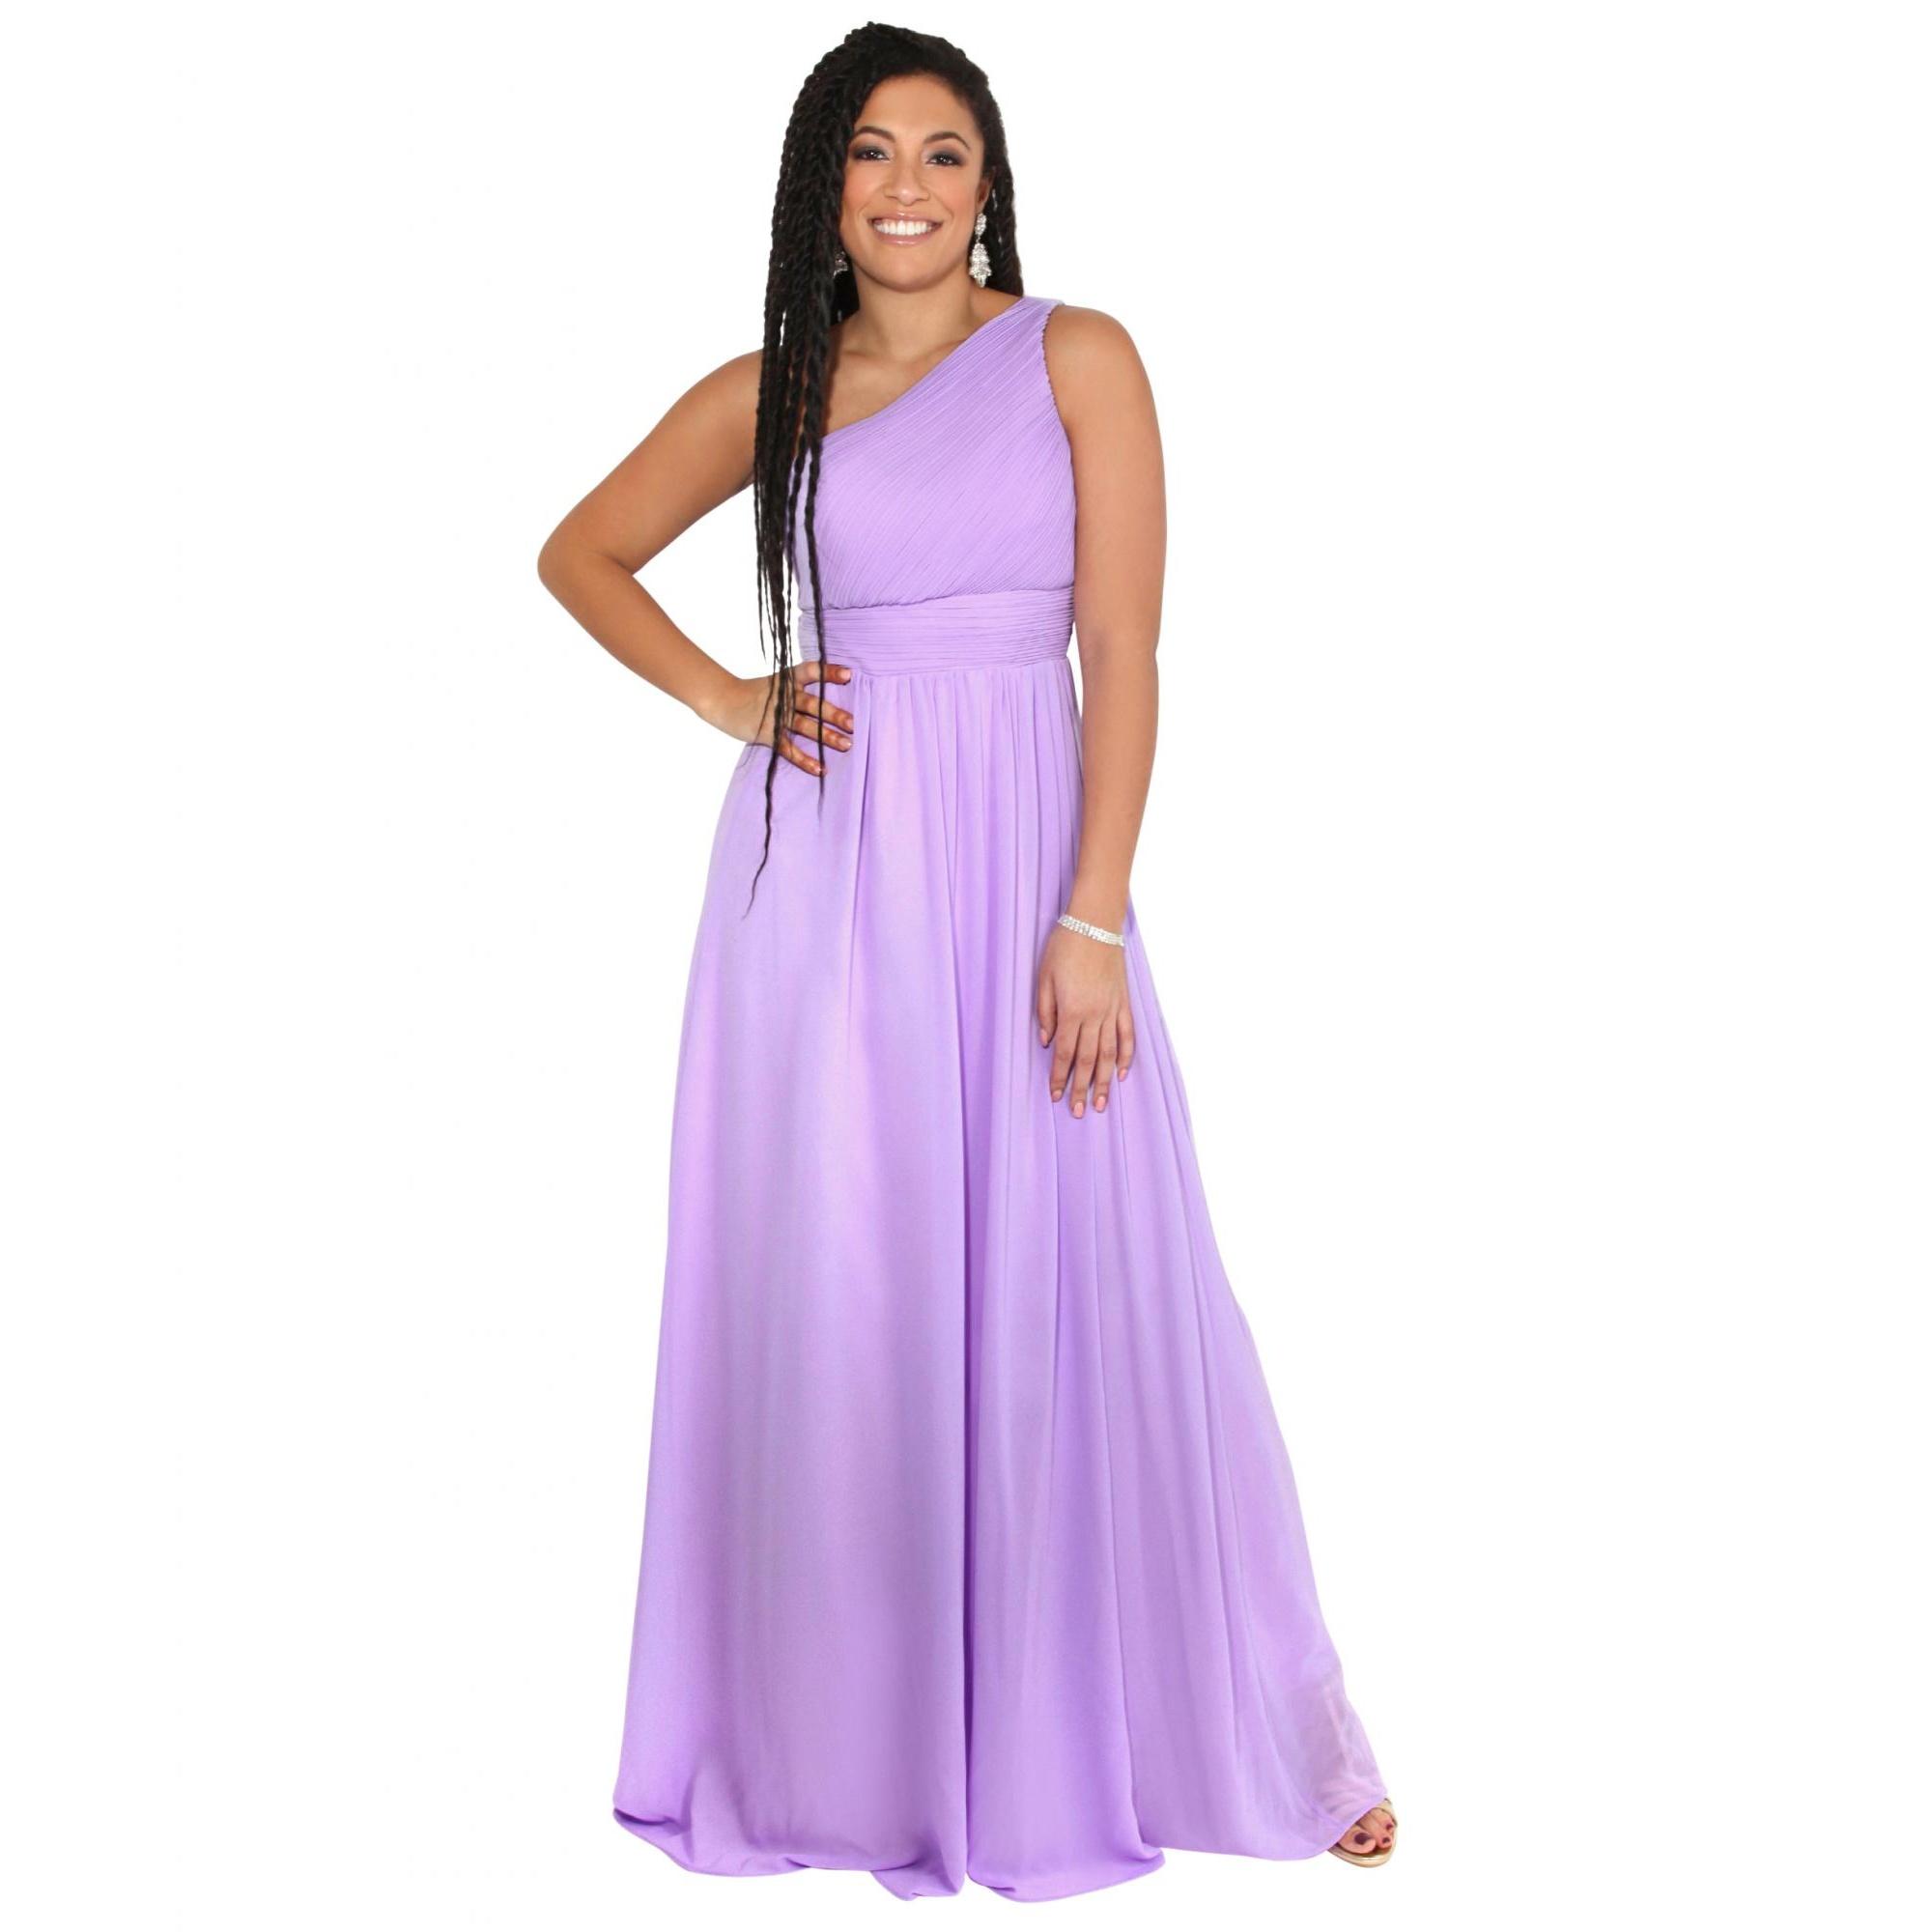 Krisp Womens/Ladies One Shoulder Evening Maxi Dress (20 UK) (Lilac)